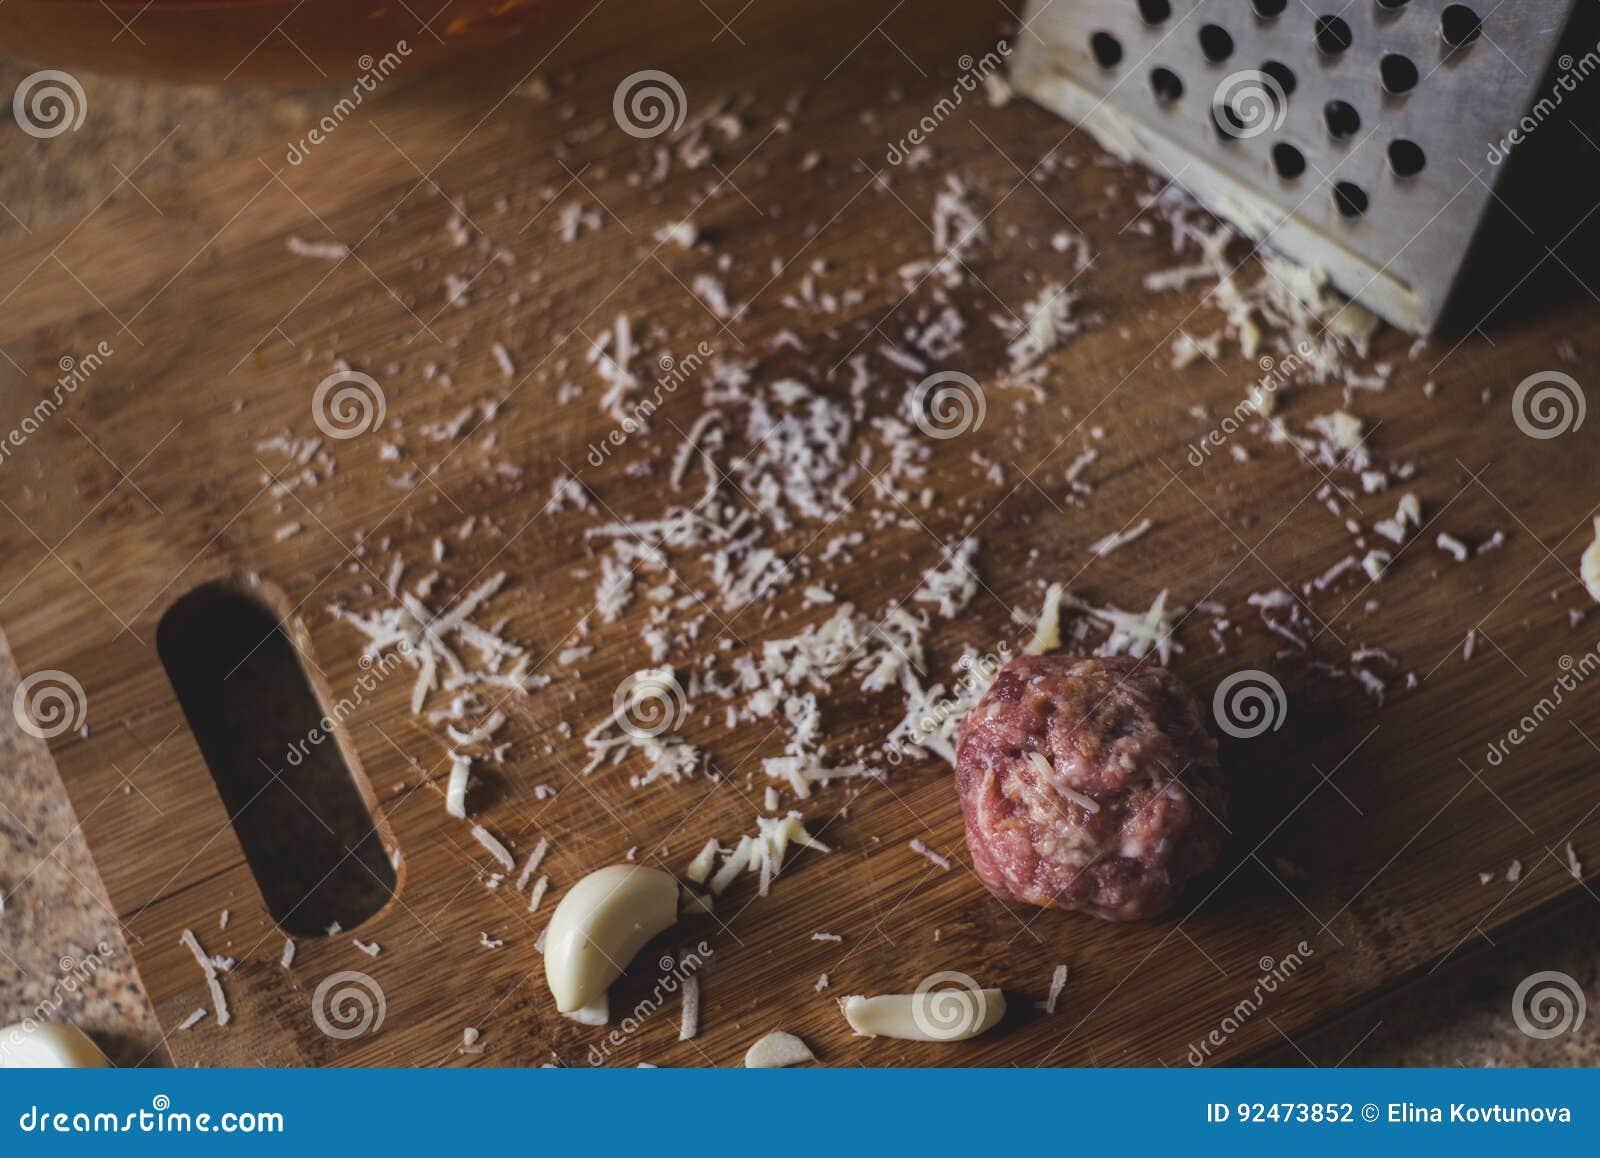 Wat kaas, vlees en knoflook op een houten broodplank